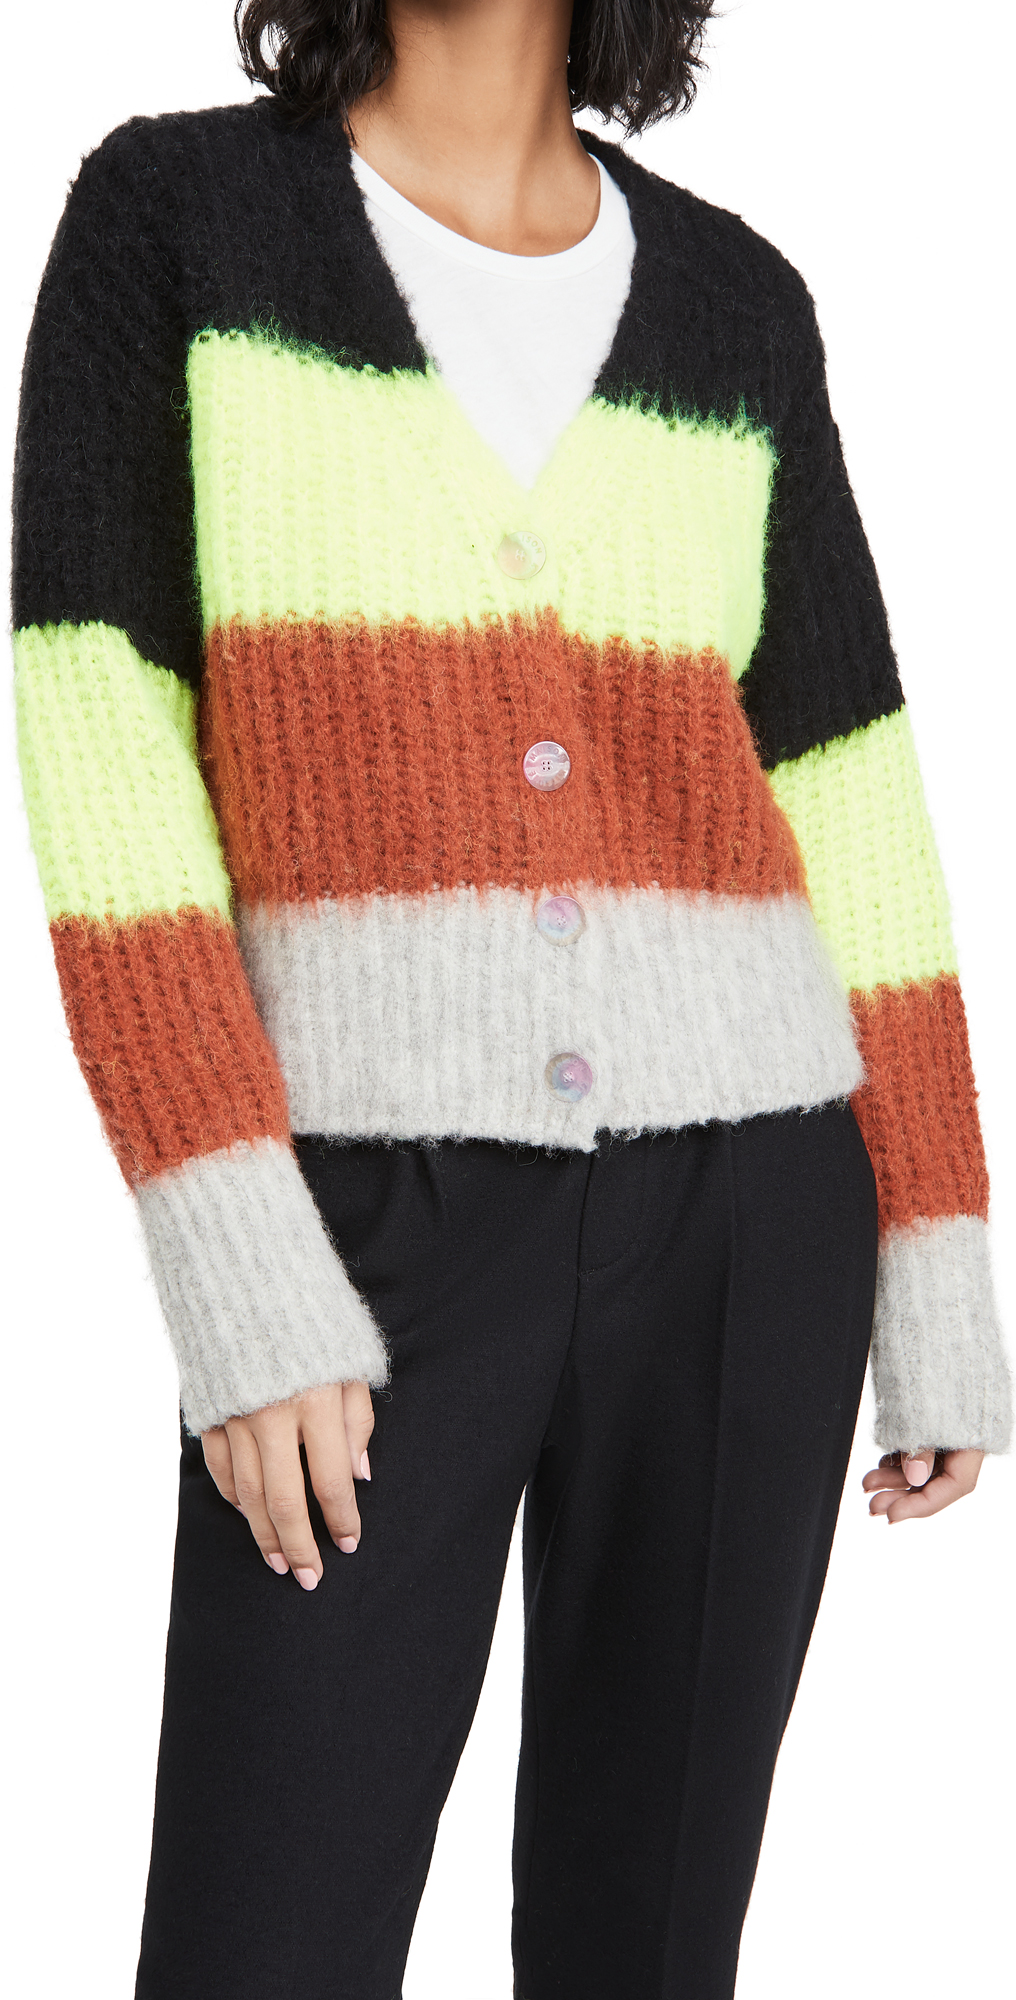 Maison Kitsune Fluffy Stripes Boxy Cardigan